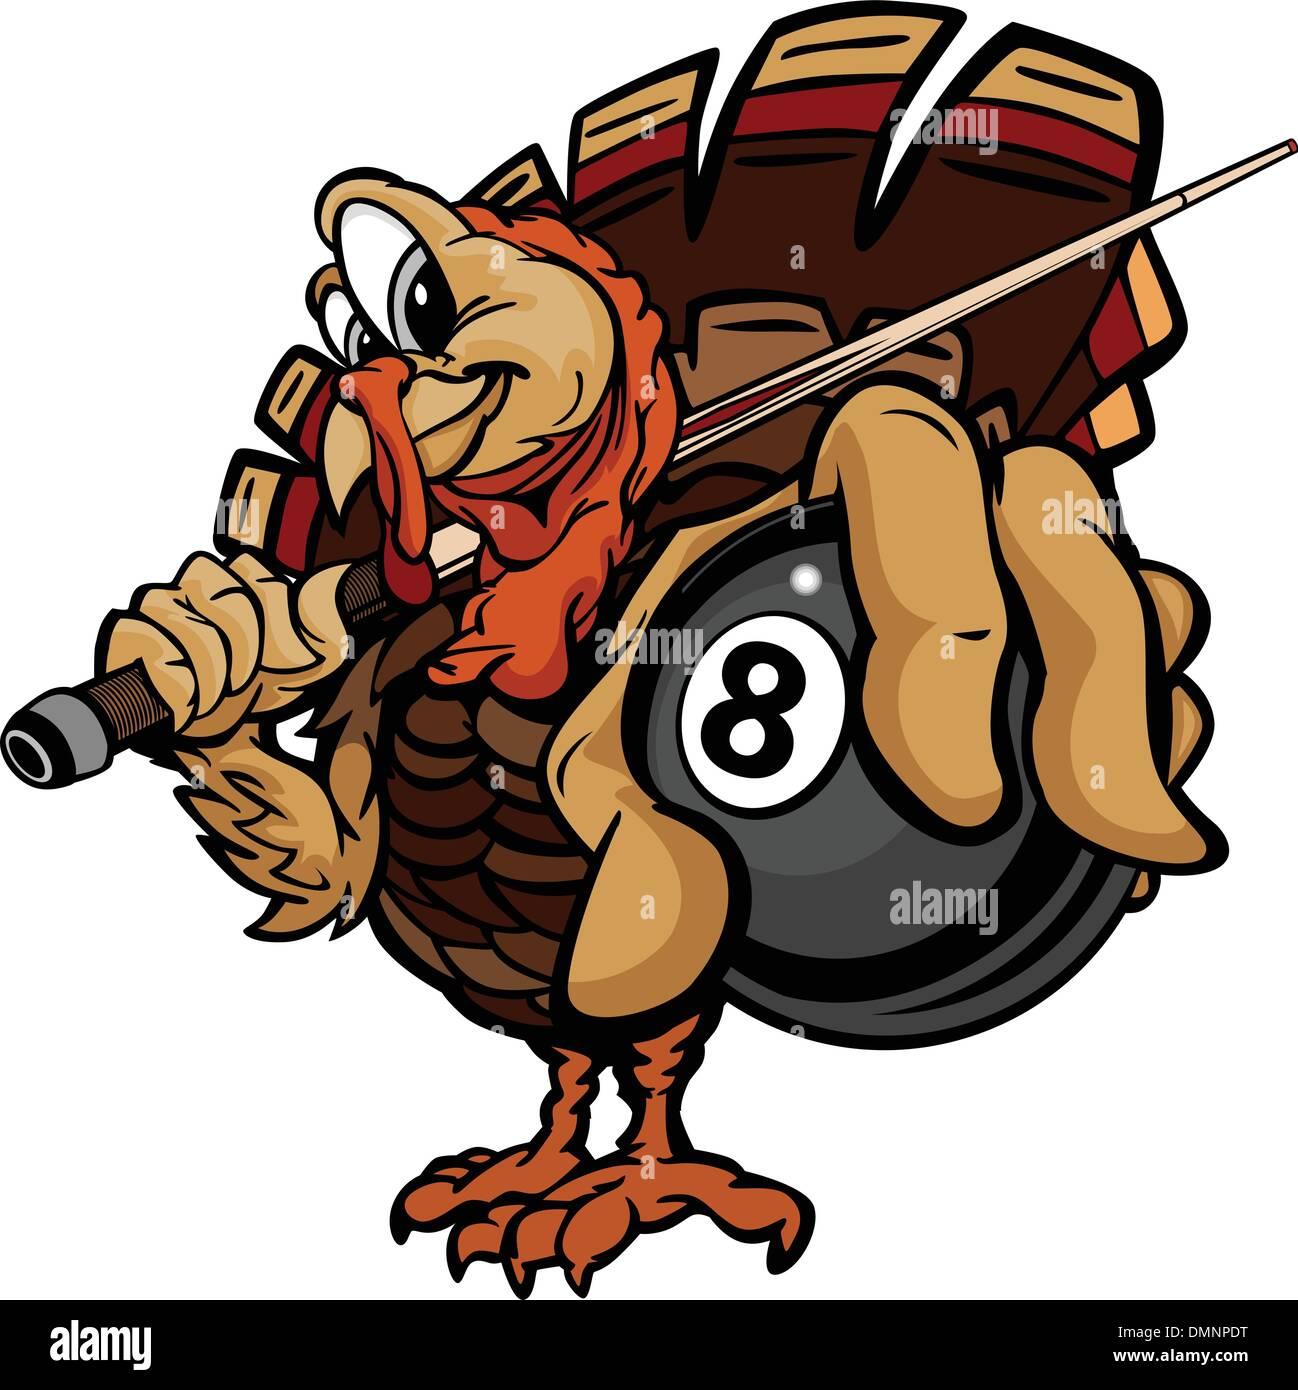 Billiards Eight Ball Thanksgiving Holiday Turkey Cartoon Vector - Stock Vector